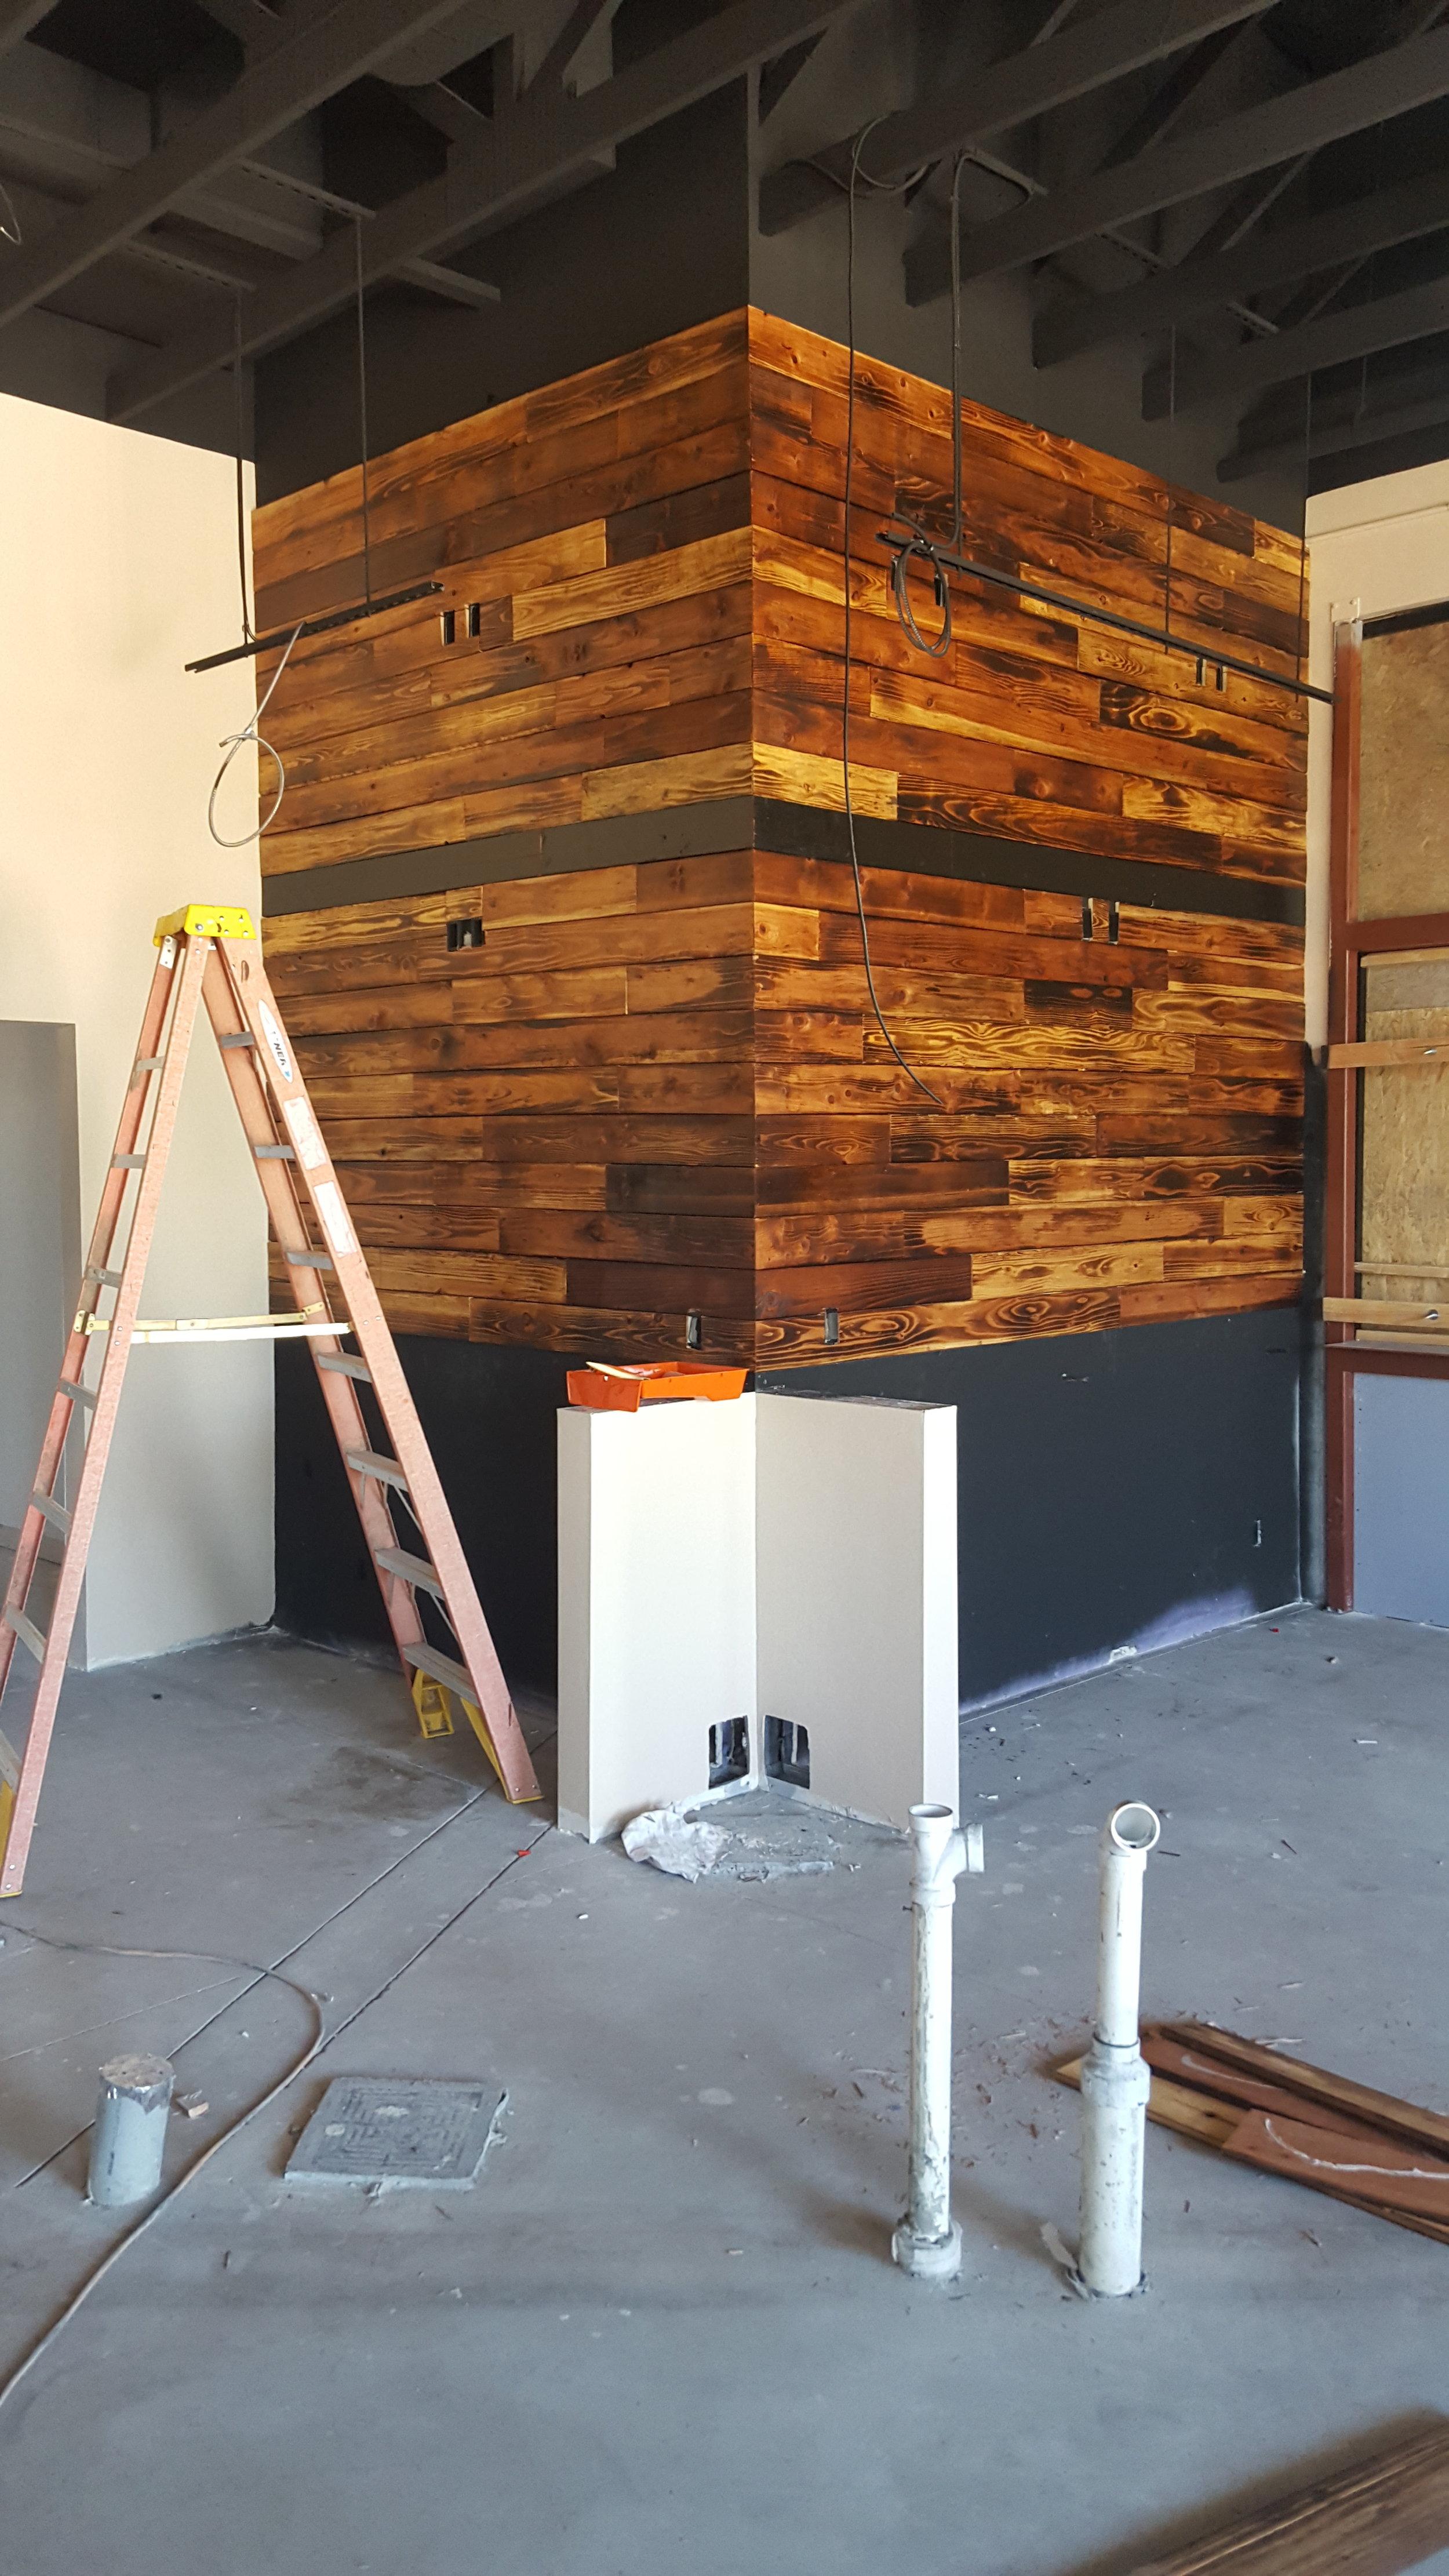 redwood-wall-bar-1.jpg